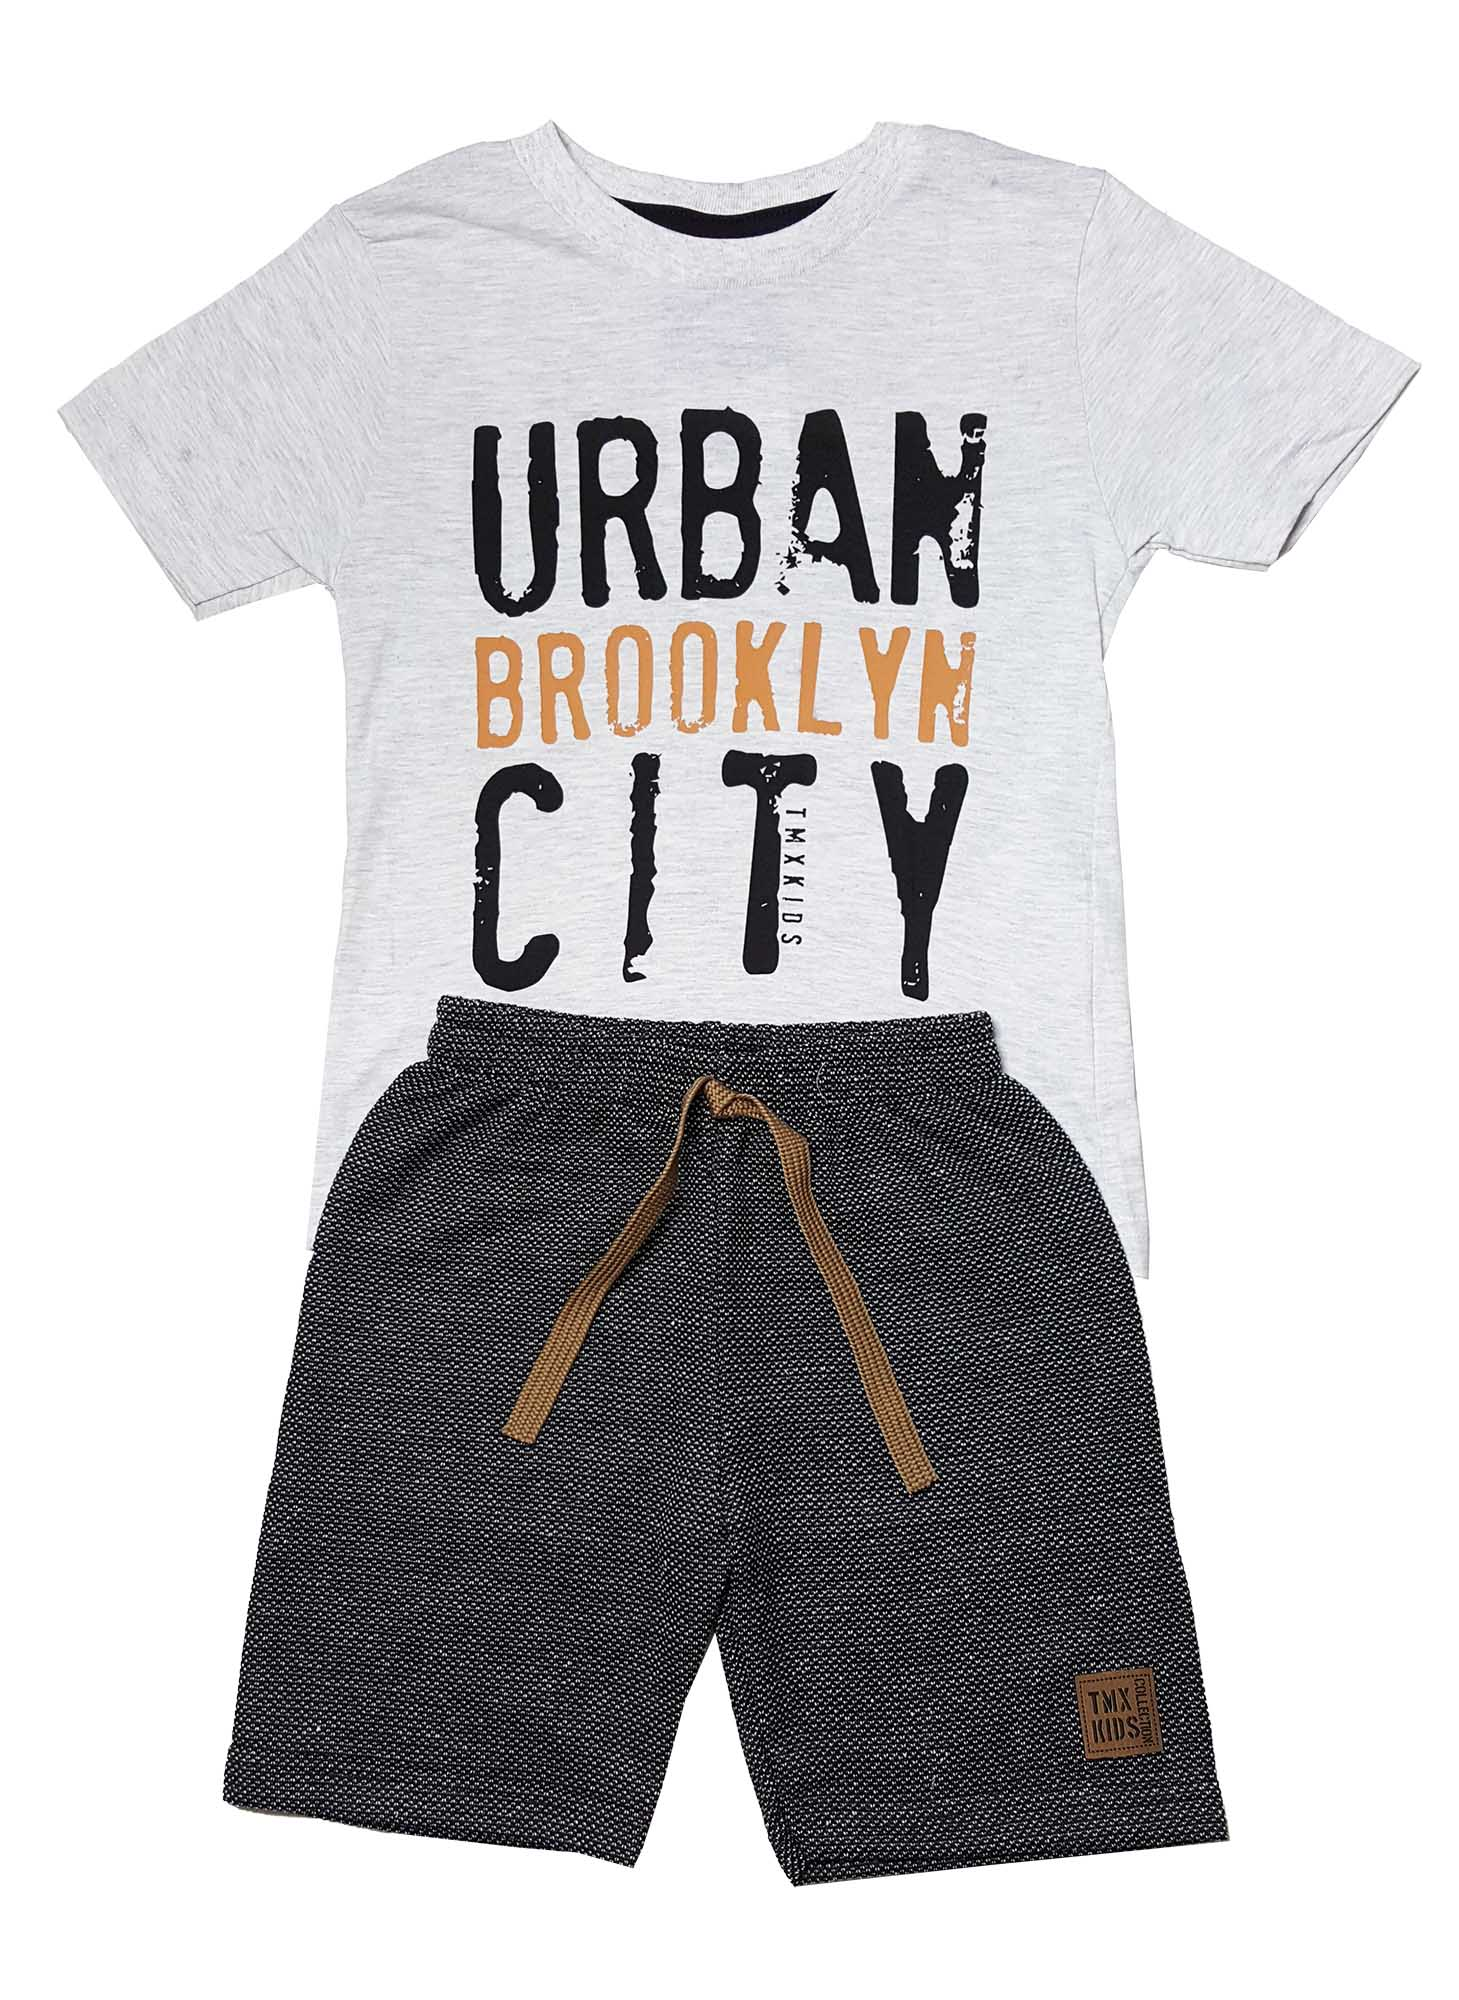 be29375393 Conjunto Camiseta e Bermuda Moletom Ecológico TMX Urban Mescla Preto -  Sonho colorido ...